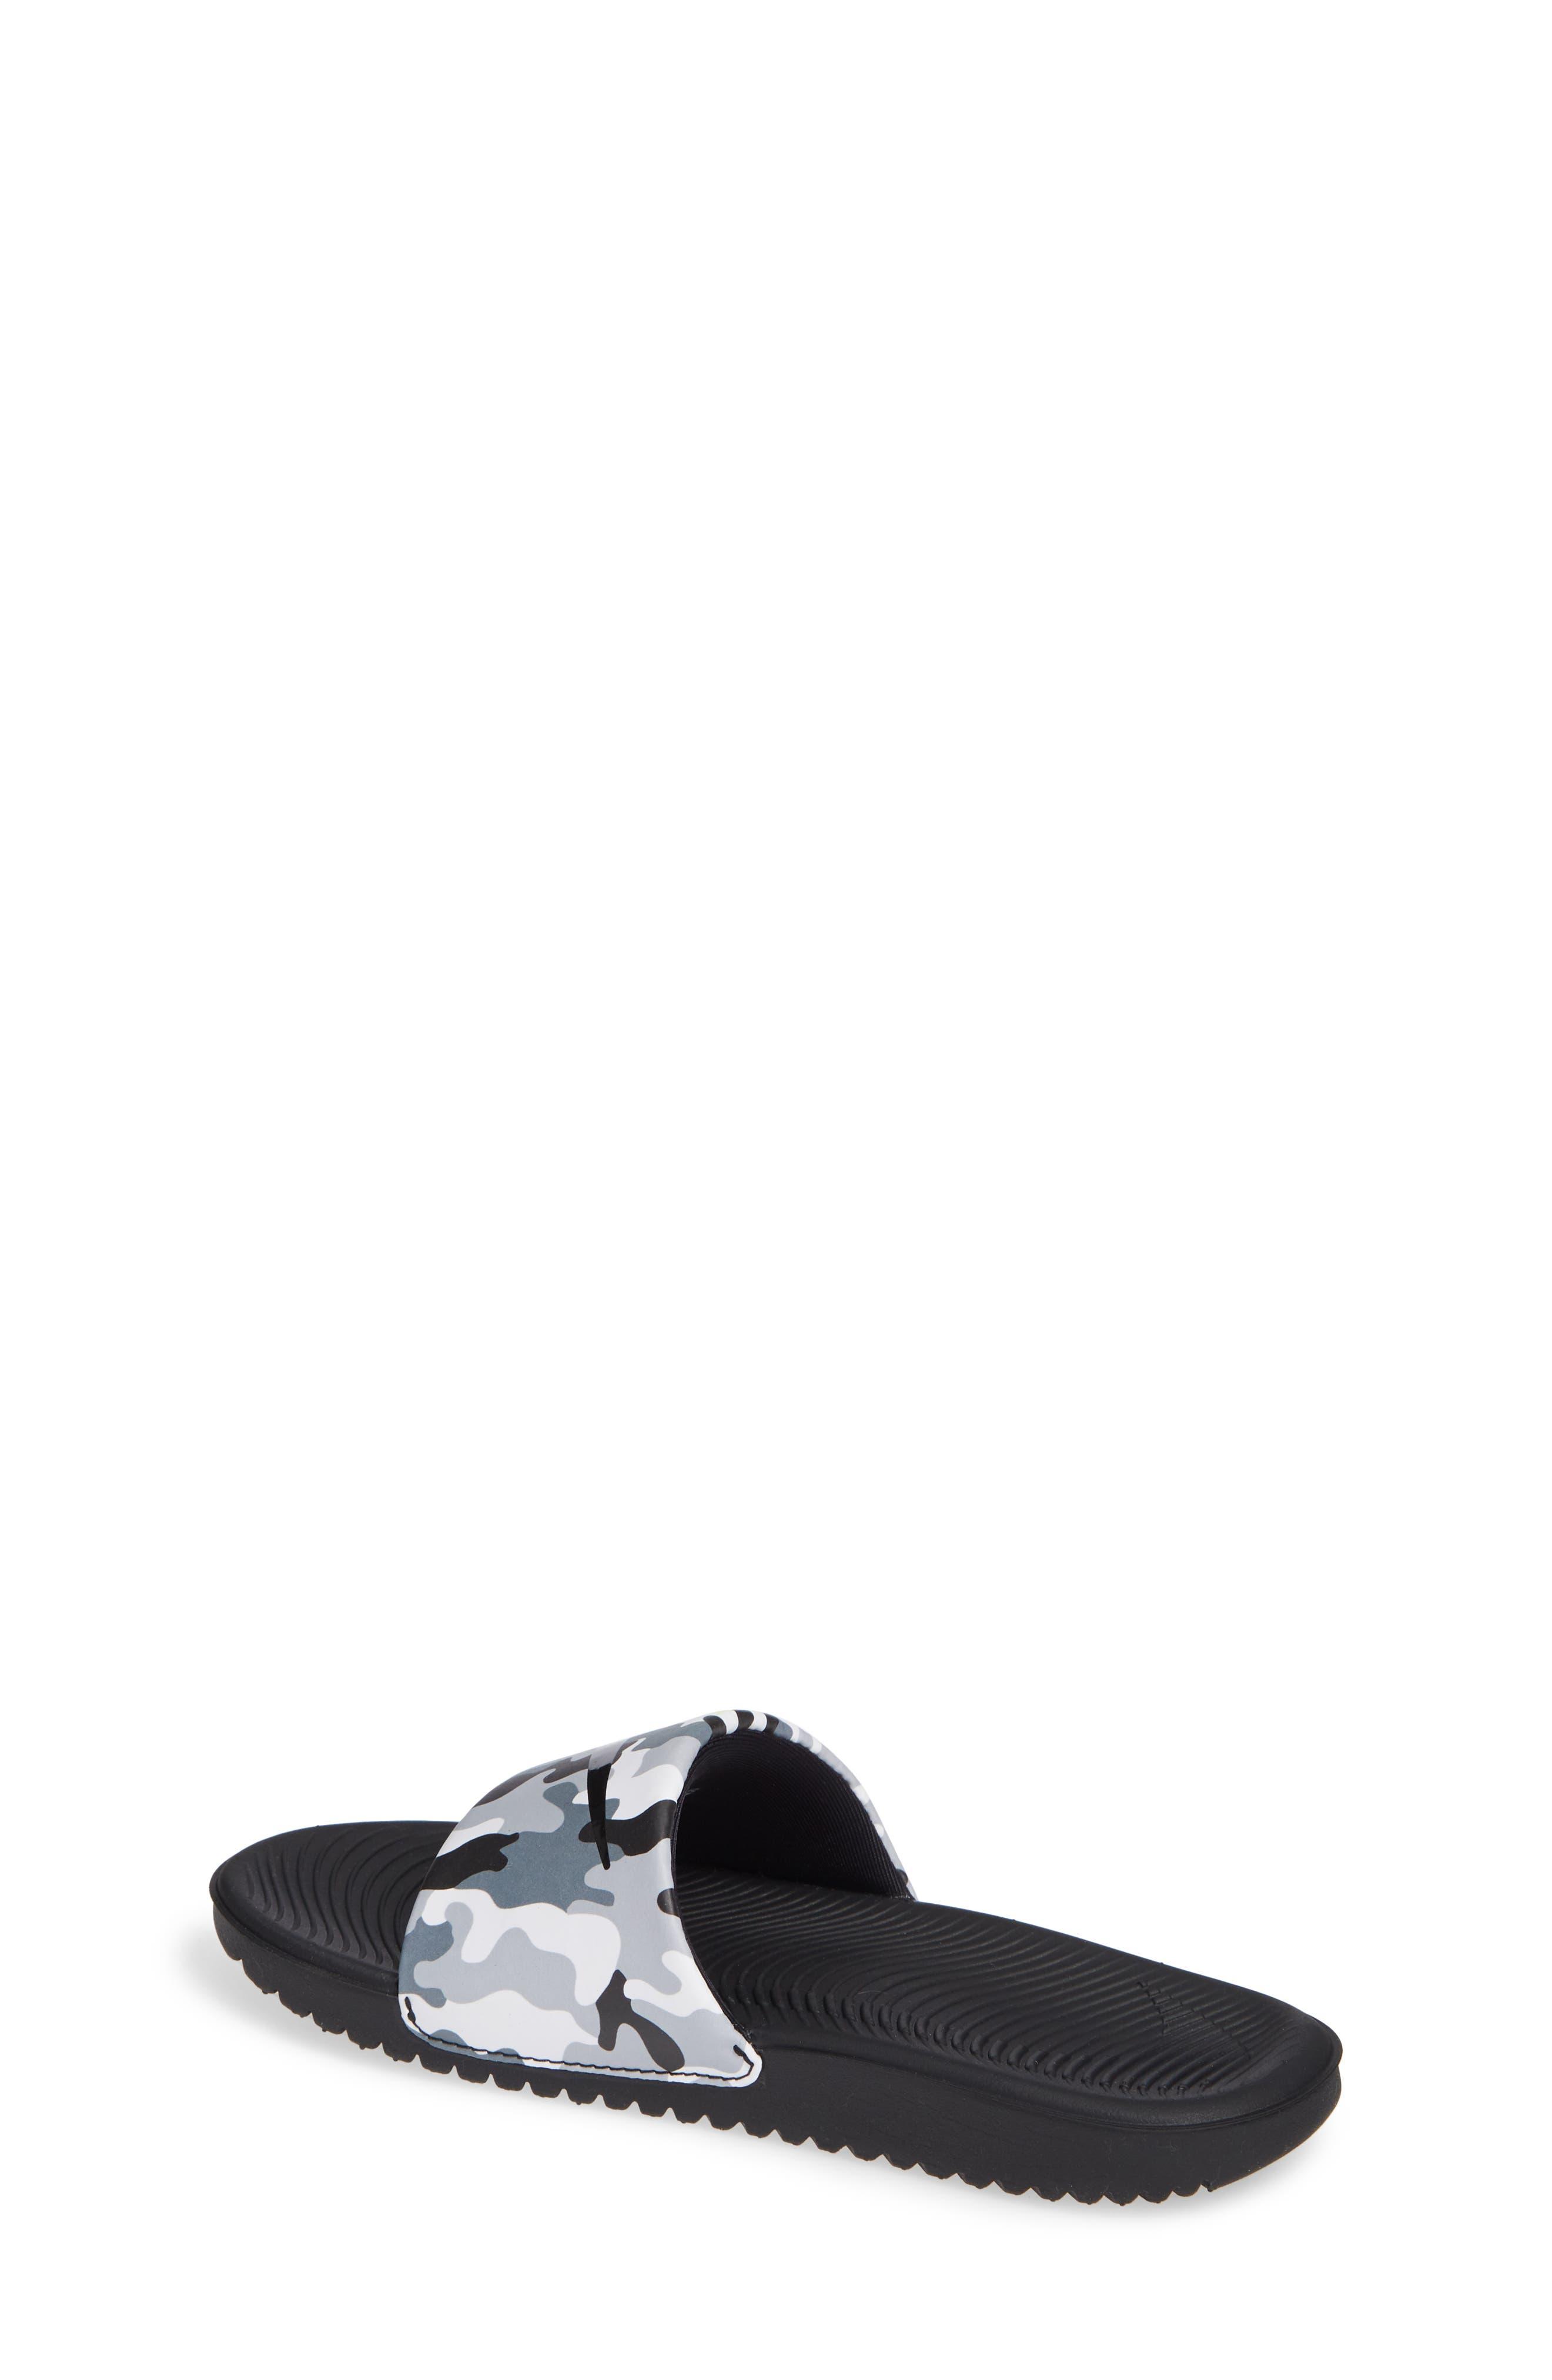 NIKE, Kawa Slide Sandal, Alternate thumbnail 2, color, WOLF GREY/ BLACK/ WHITE